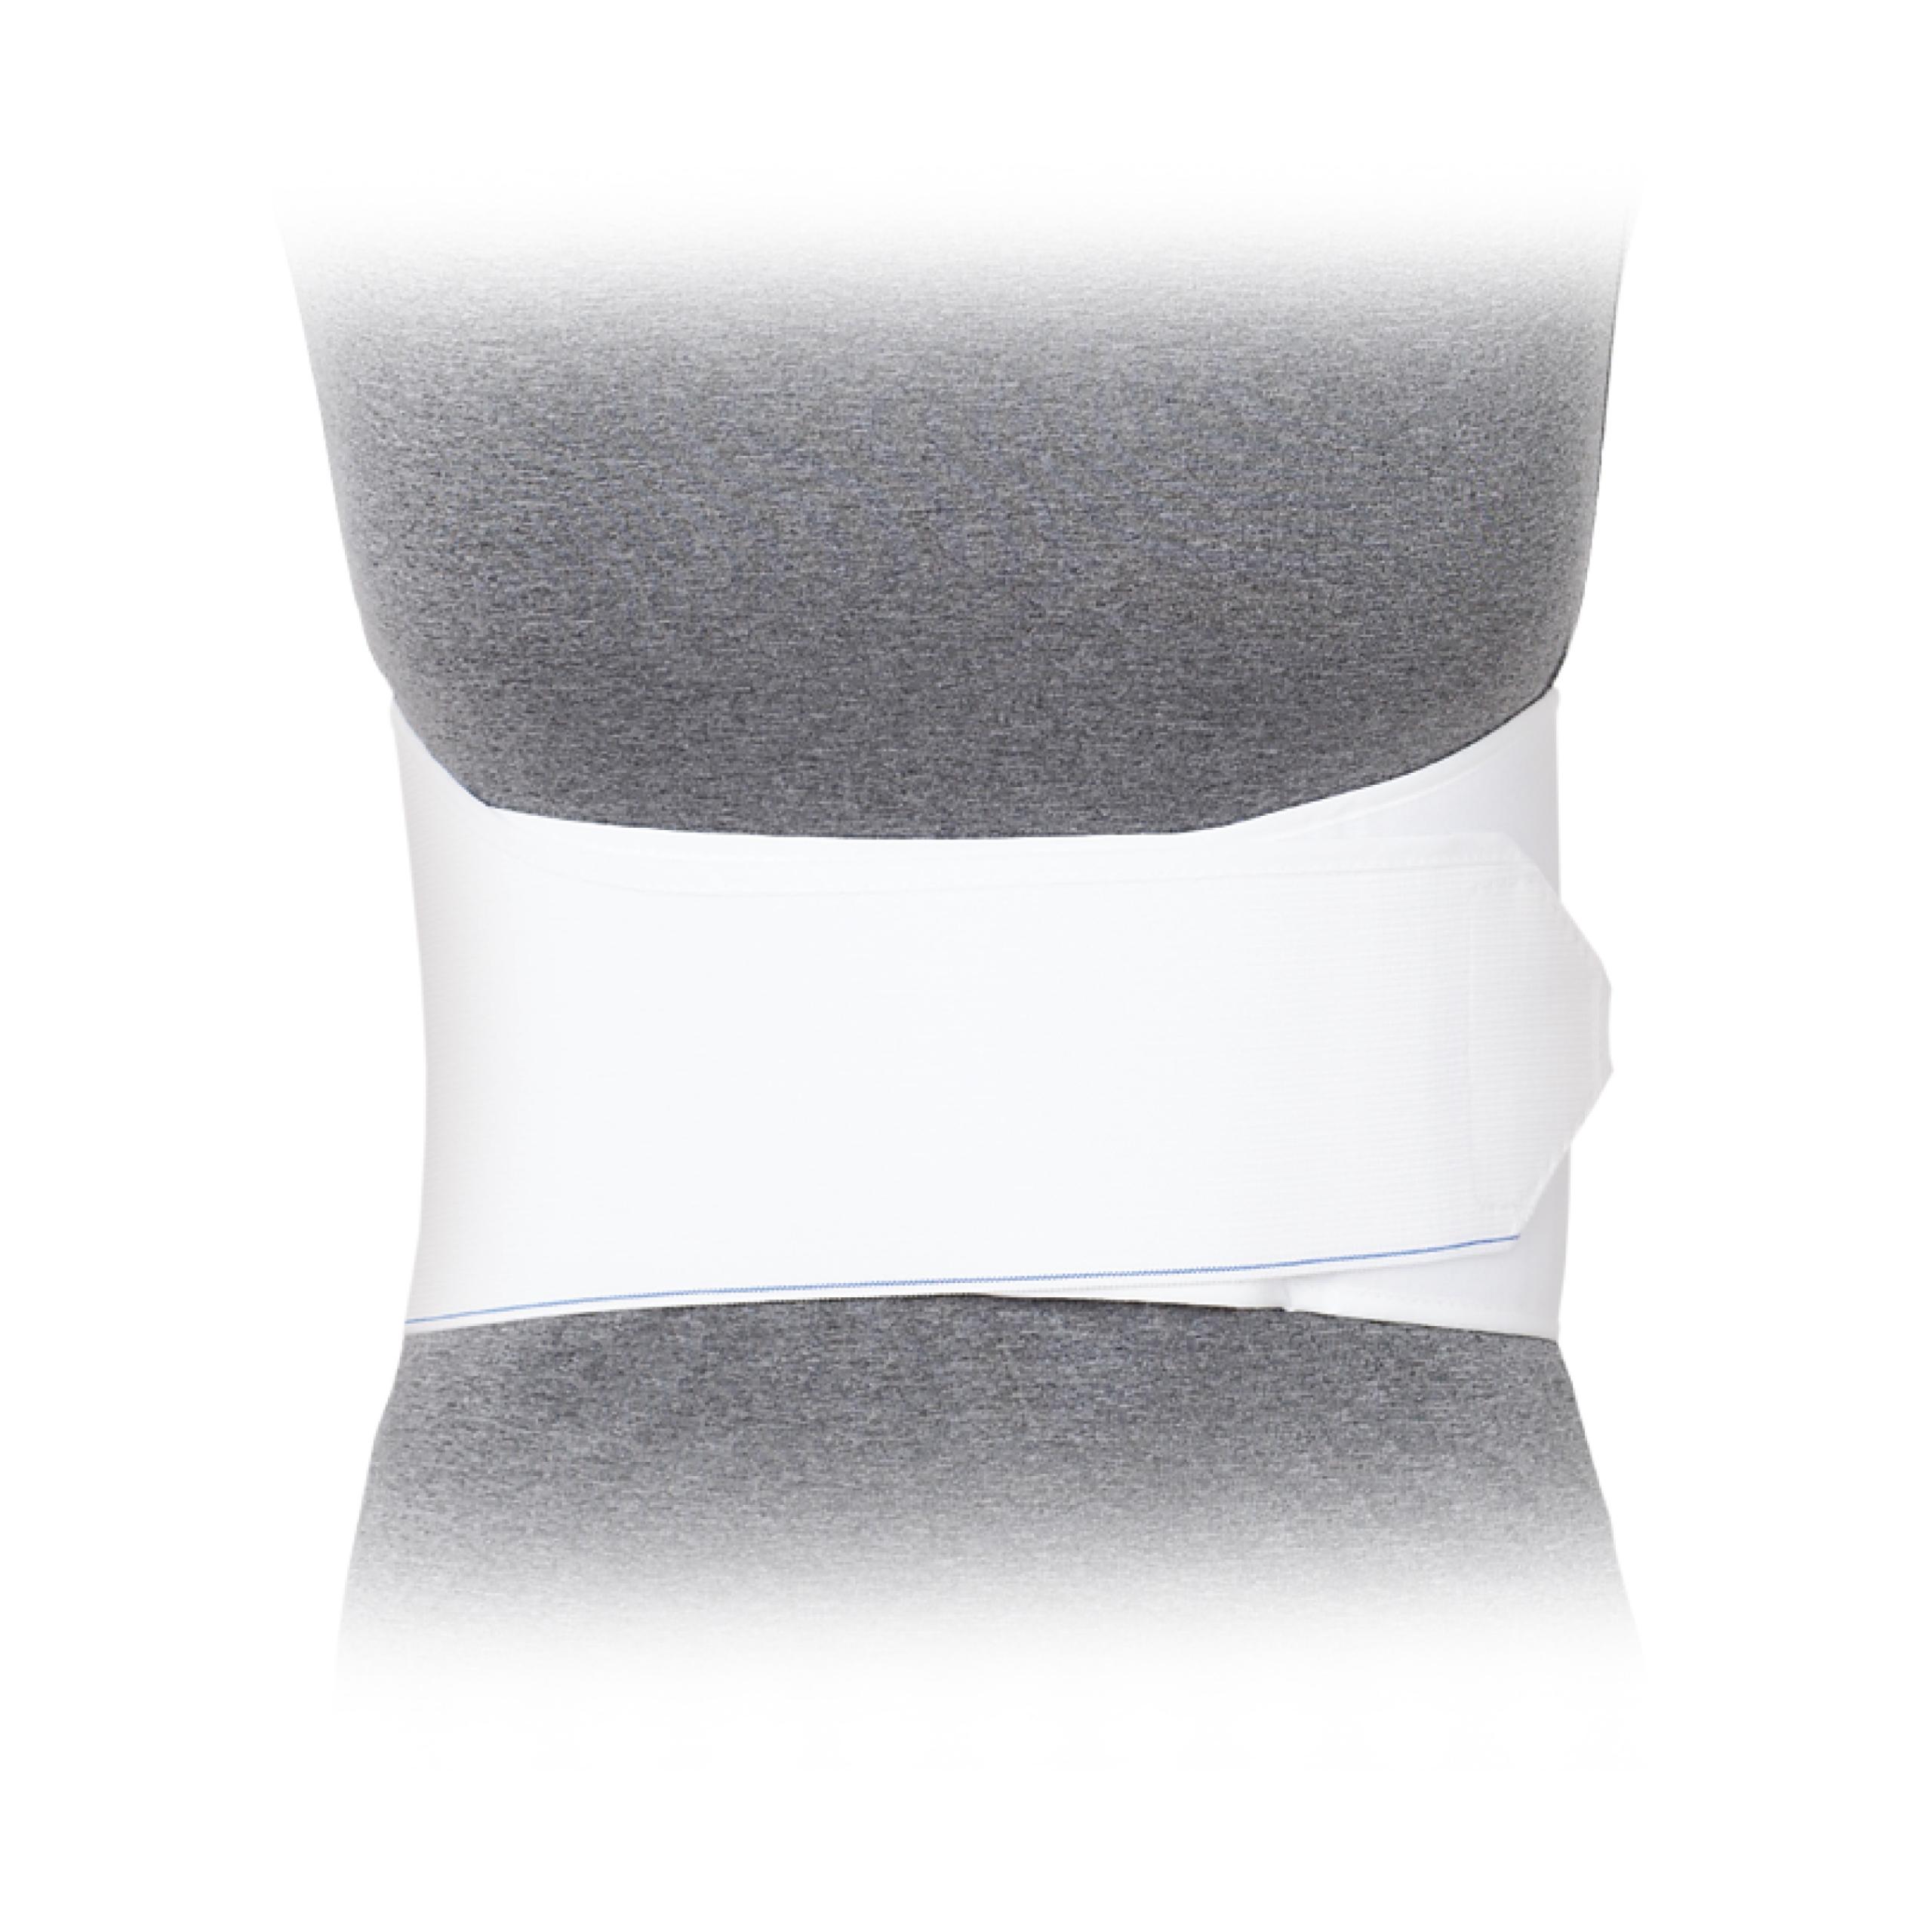 Universal Rib Belt Support